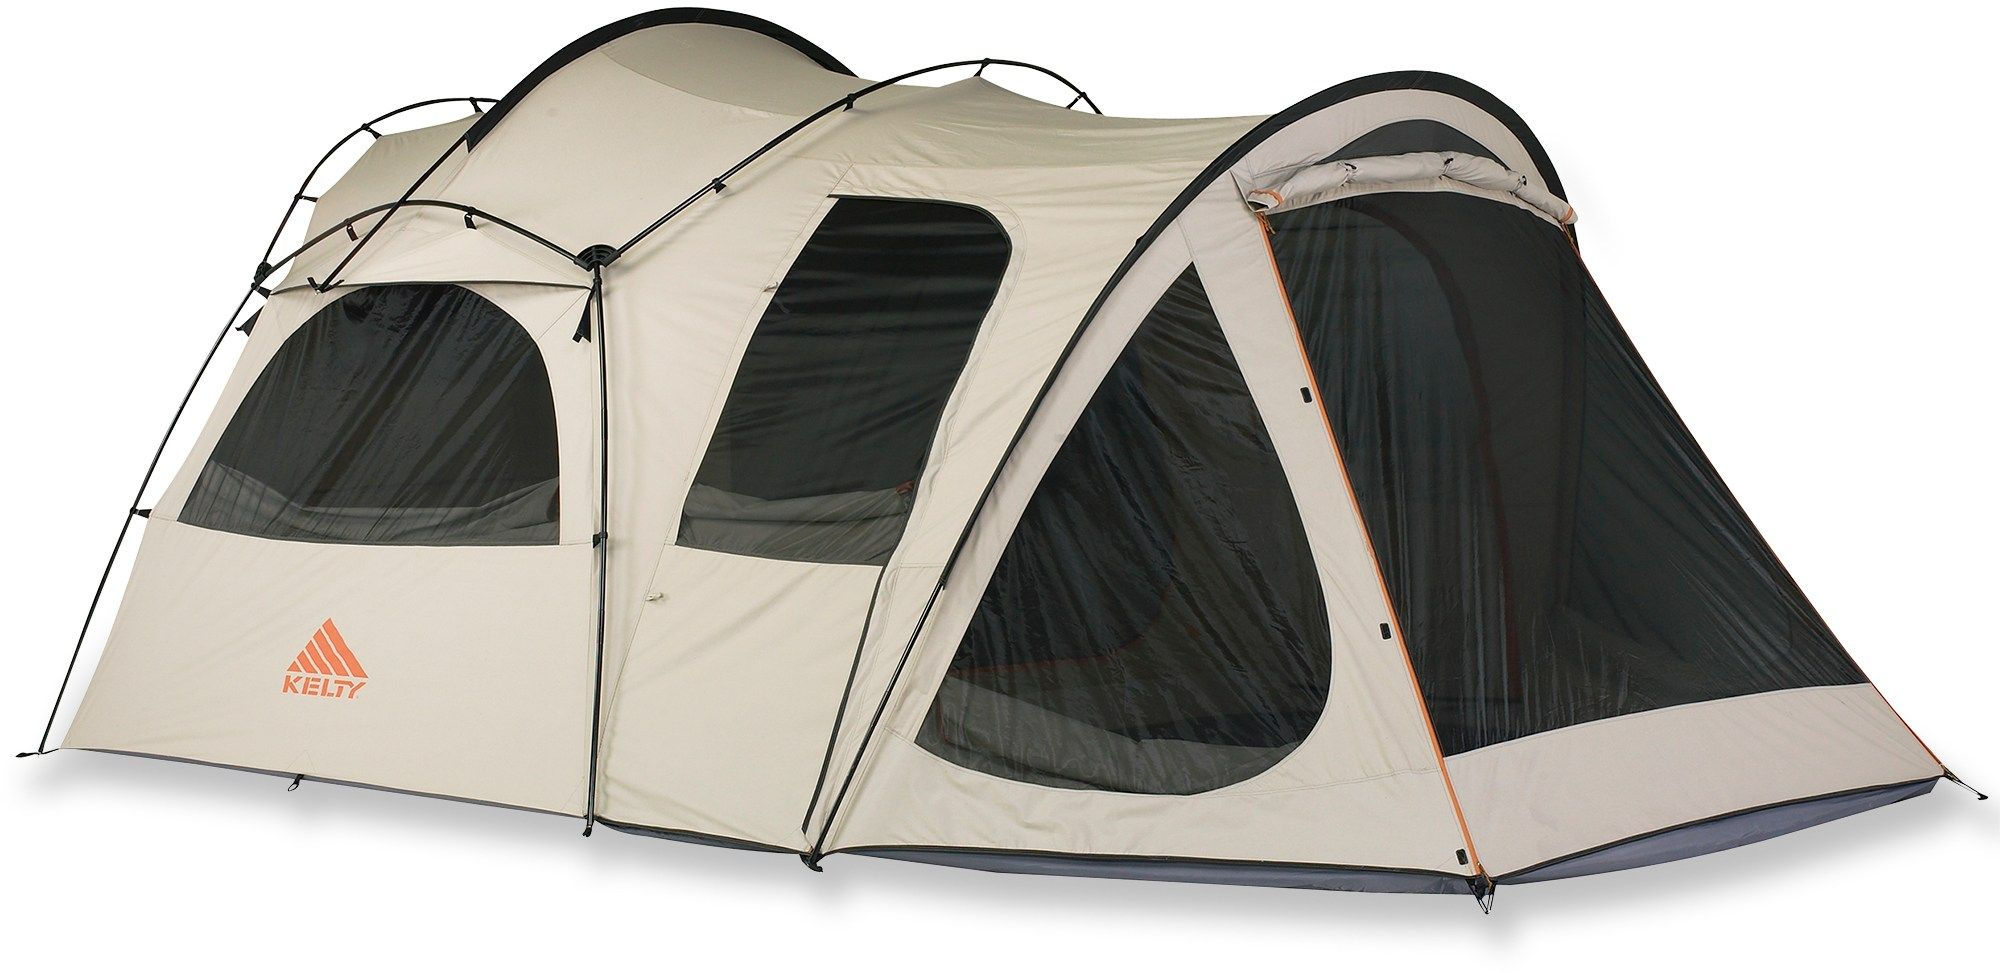 Kelty Frontier 4 Tent - 2014 Closeout  sc 1 st  pinterest.ca & Kelty Frontier 4 Tent - 2014 Closeout | camping | Pinterest | Tent ...